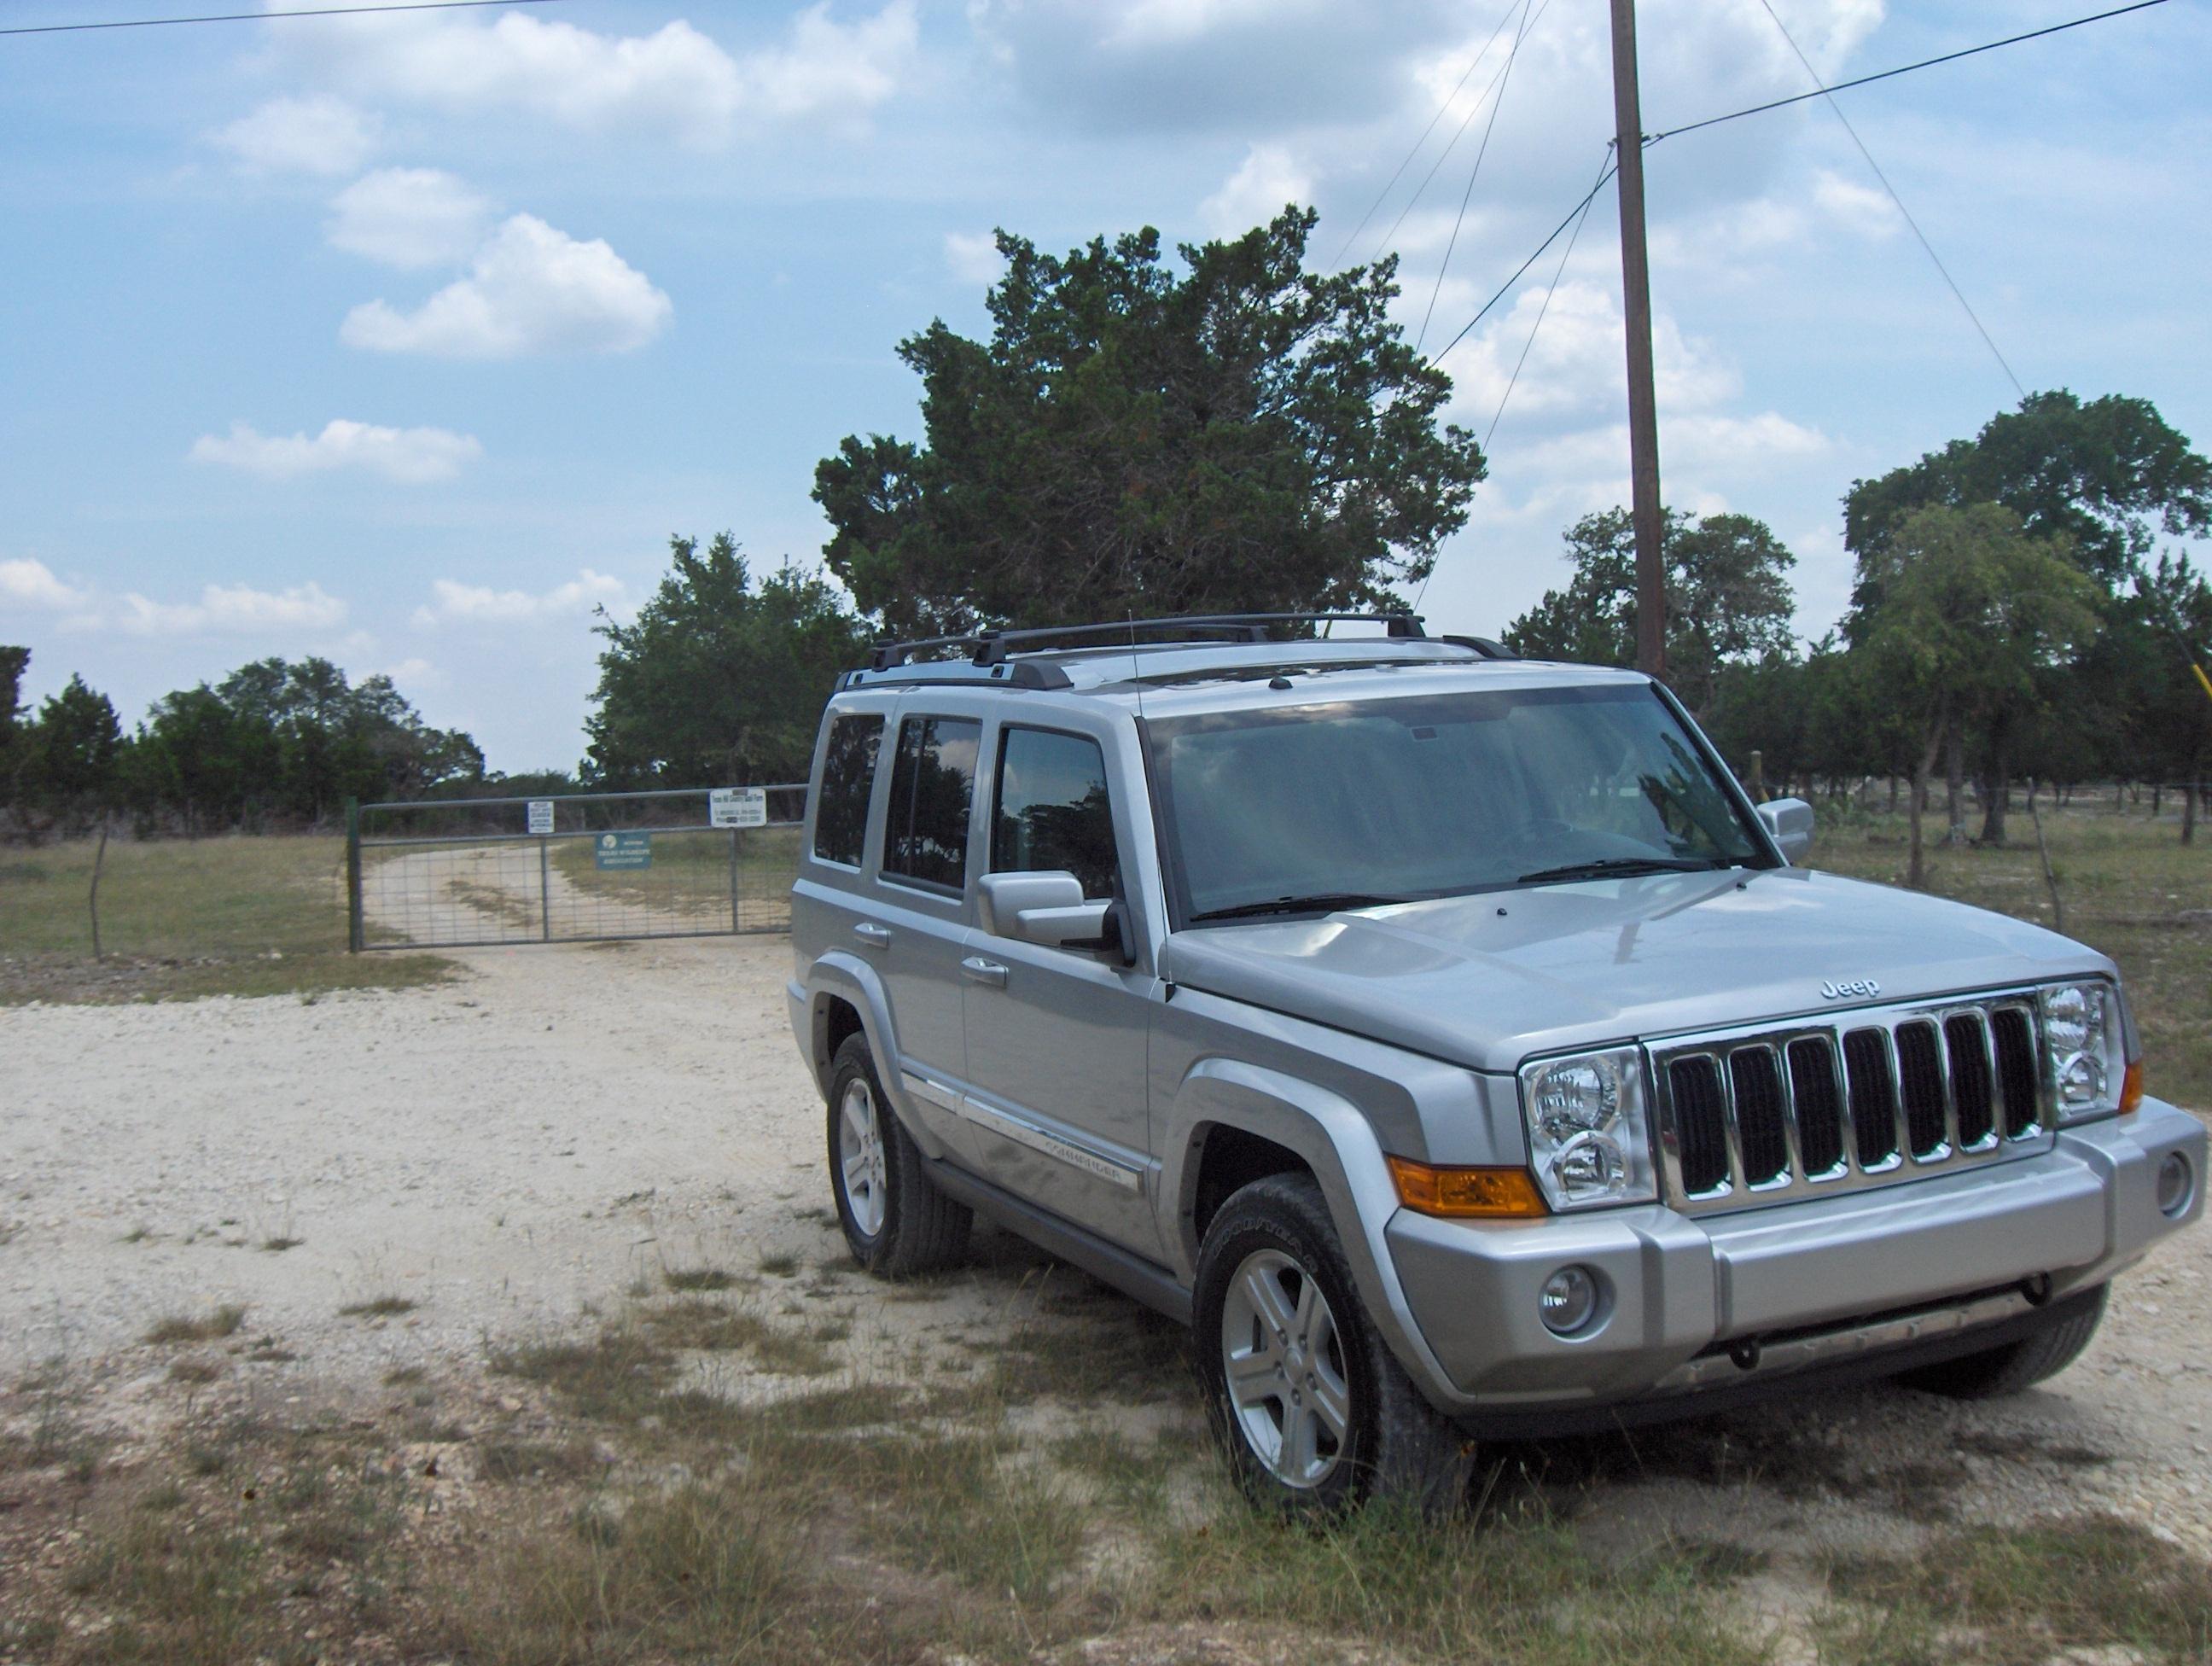 2009 jeep commander 4x4 limited review autosavant. Black Bedroom Furniture Sets. Home Design Ideas